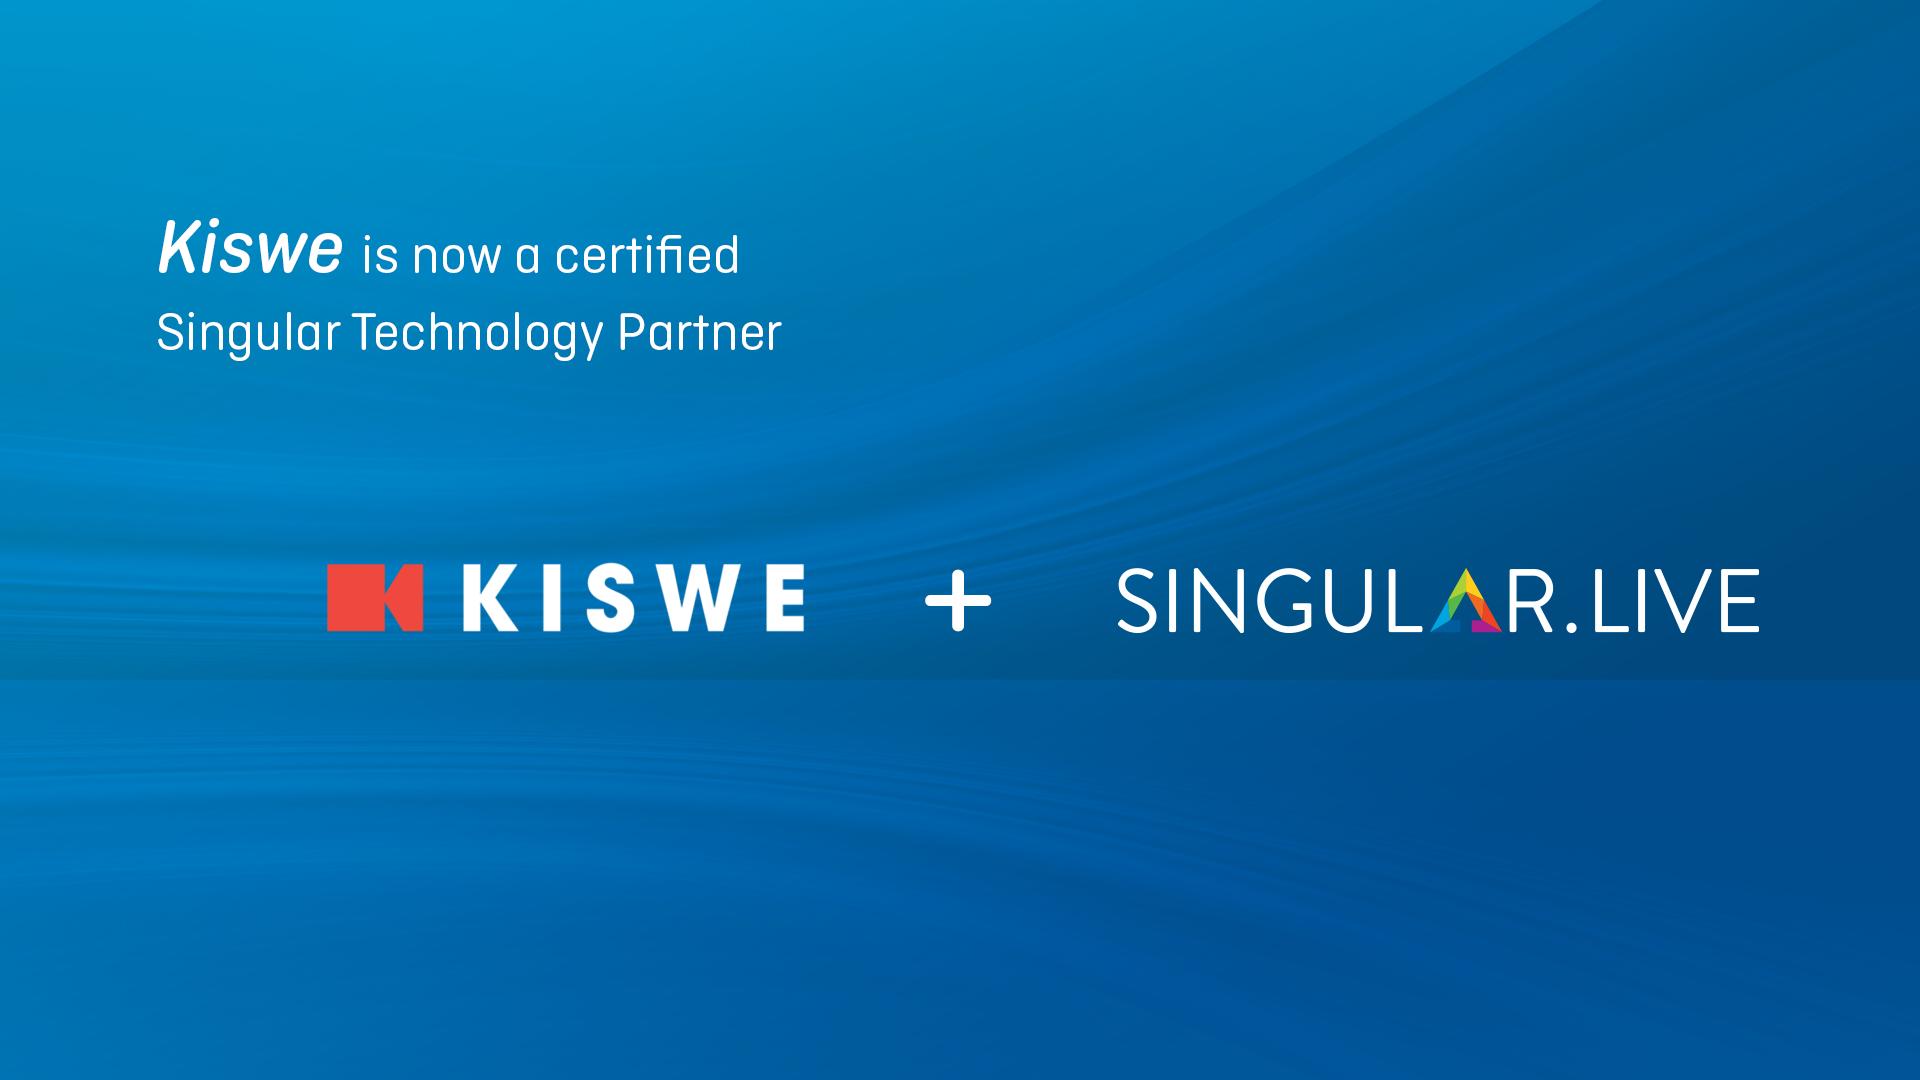 Kiswe is a Singular Certified Technology Partner